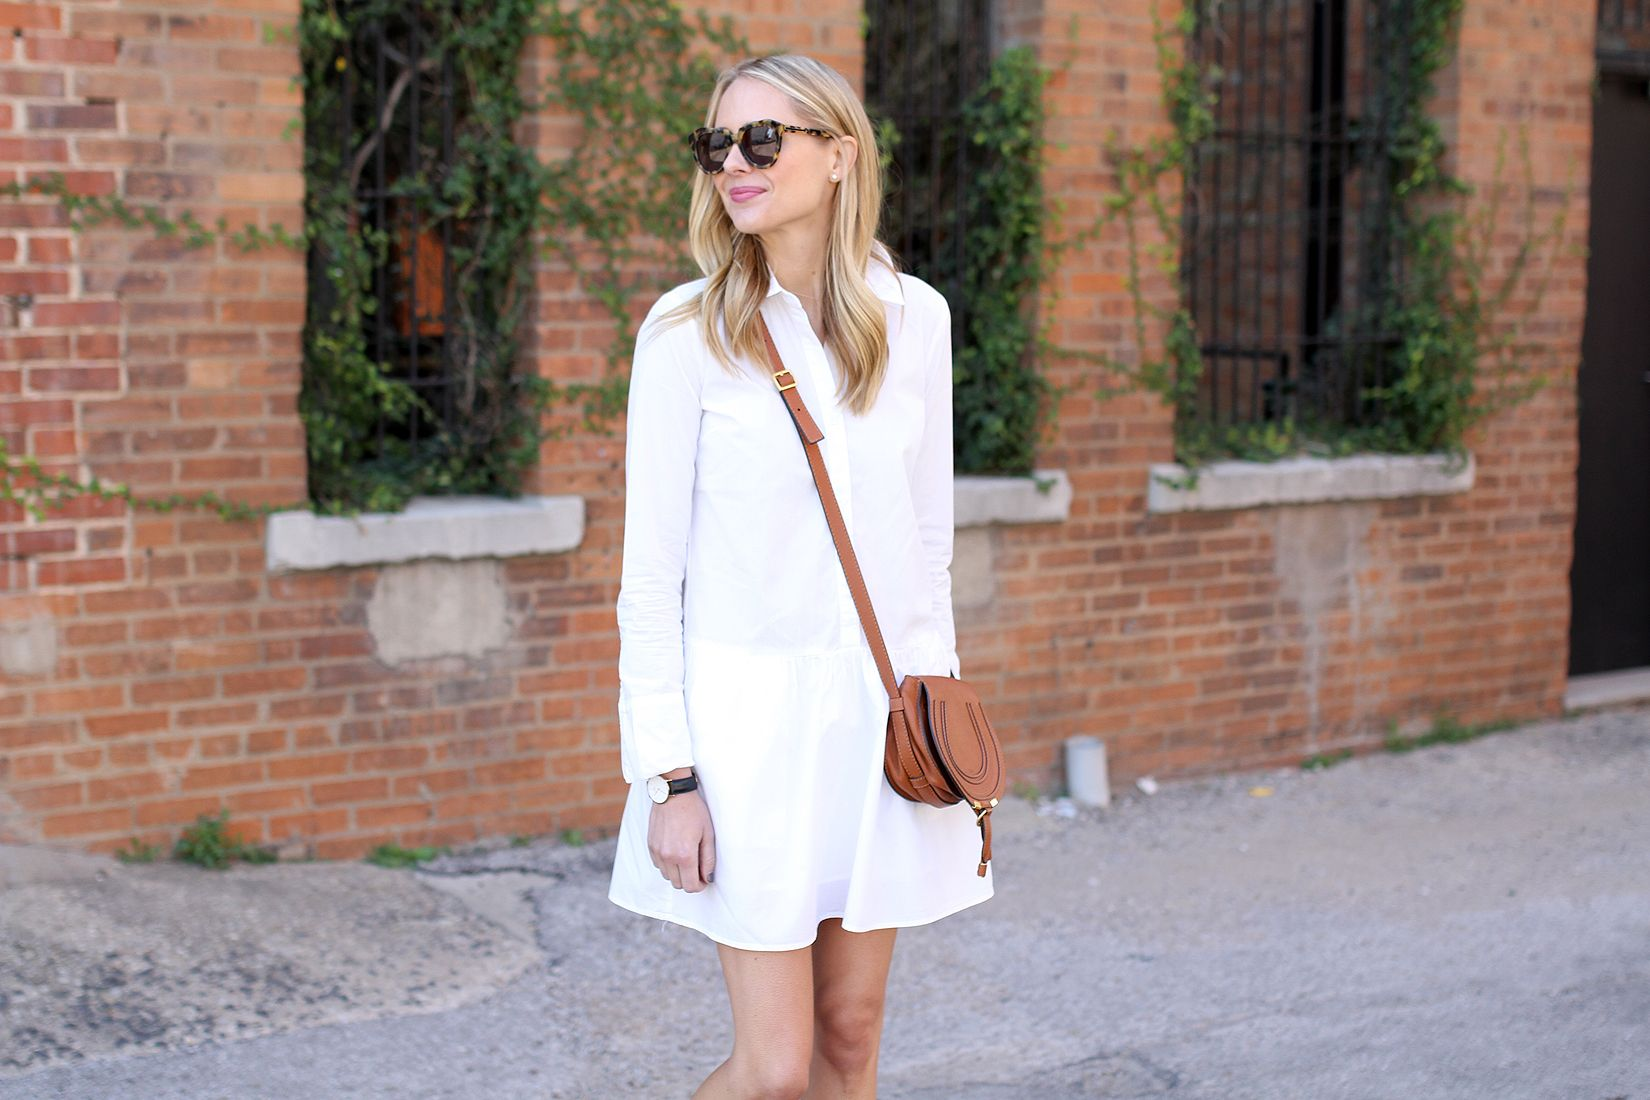 fashion-jackson-splendid-damsel-white-shirt-dress-karen-walker-sunglasses-chloe-marcie-tan-crossbody   splendidla  chloefashion 3c6edacbb